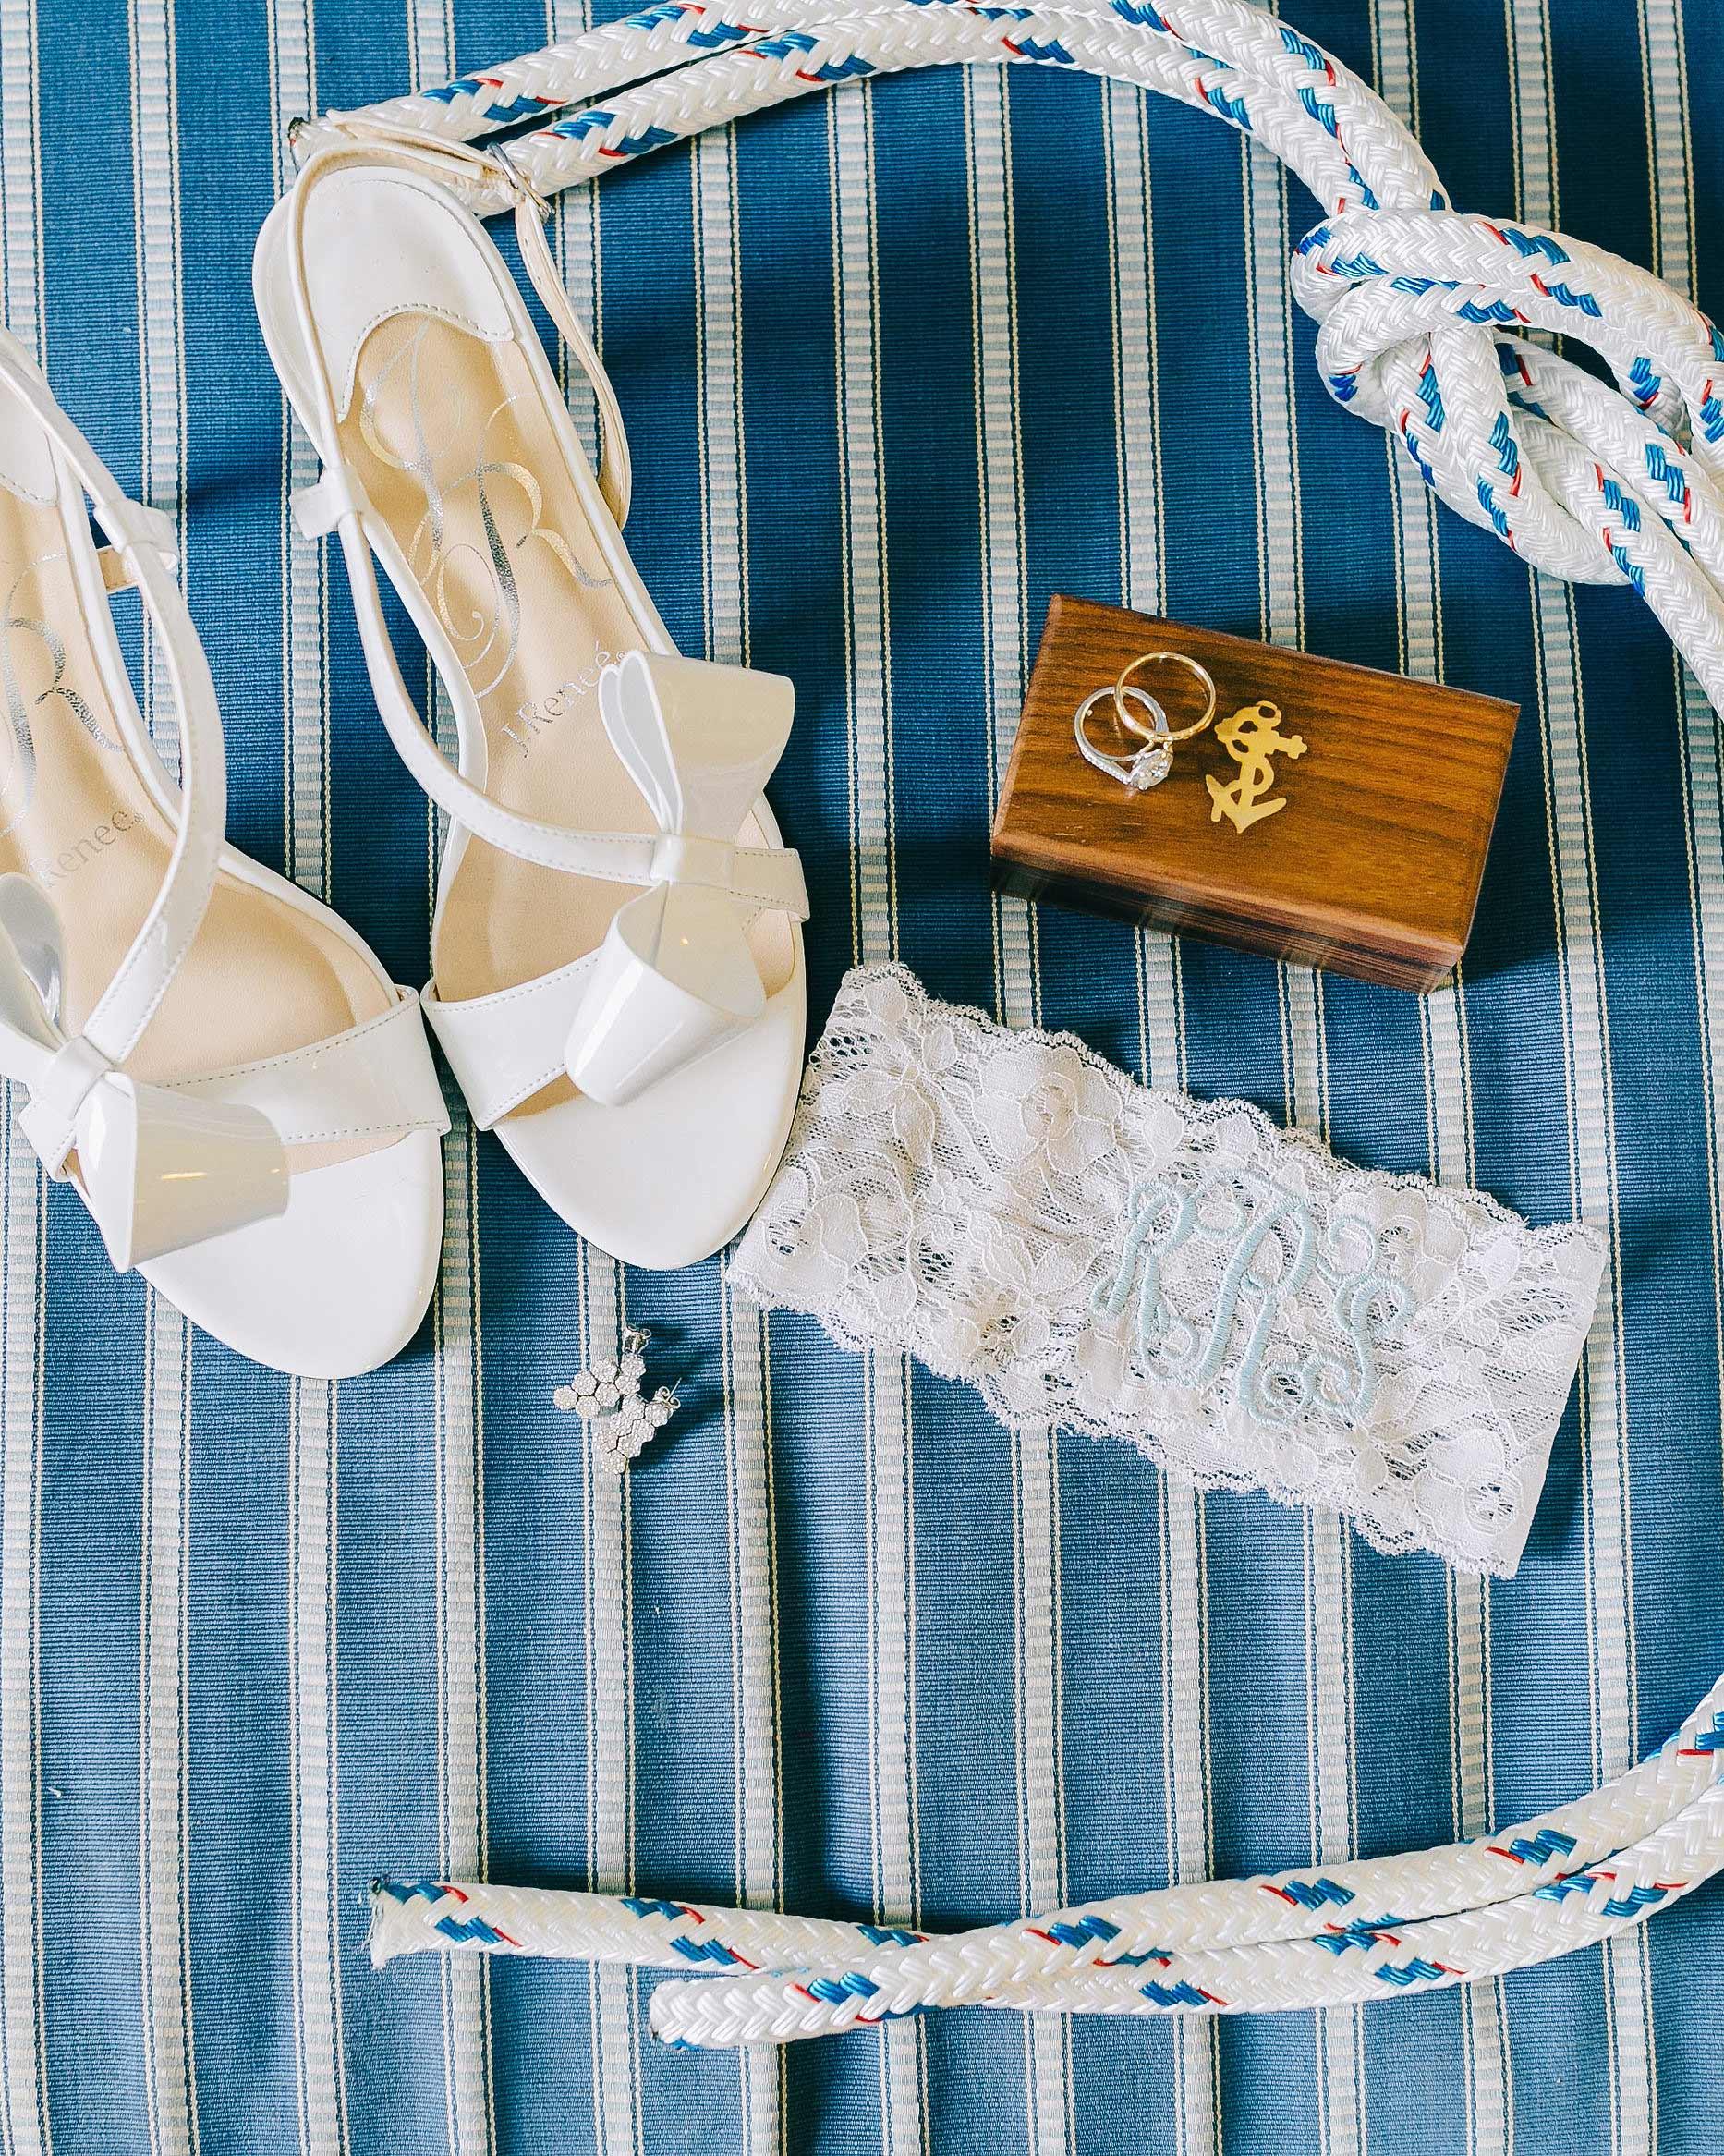 rachel-jurrie-nautical-wedding-accessories-0024-s112778-0416.jpg